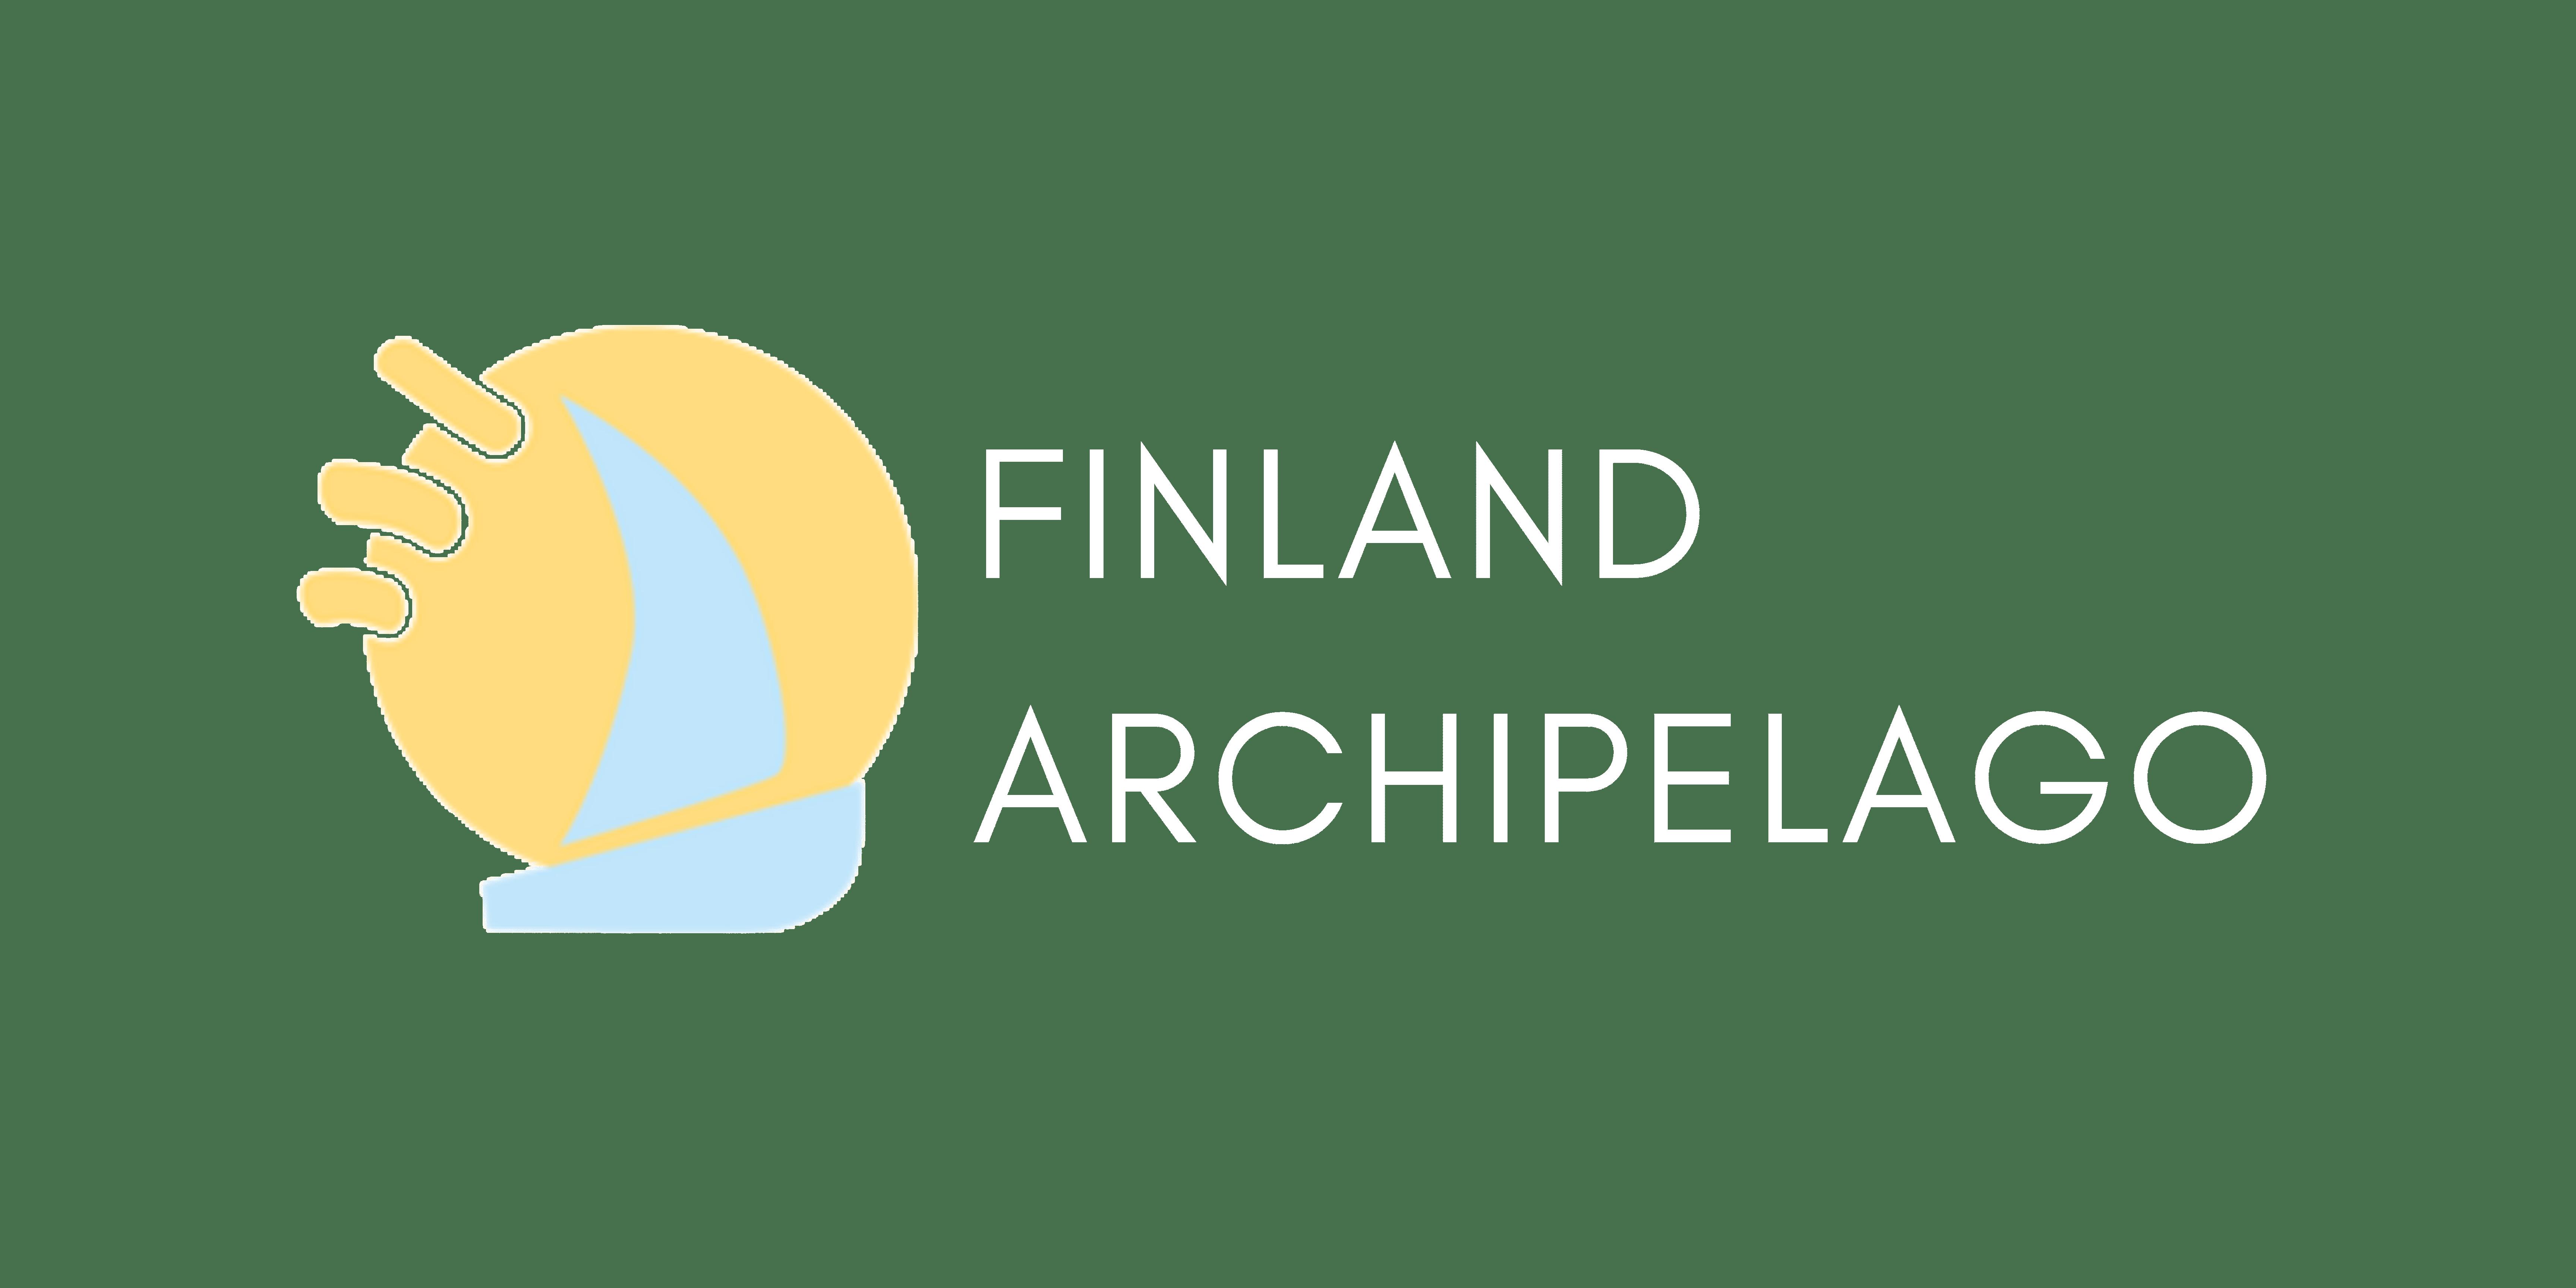 Finland Archipelago - Yellow White